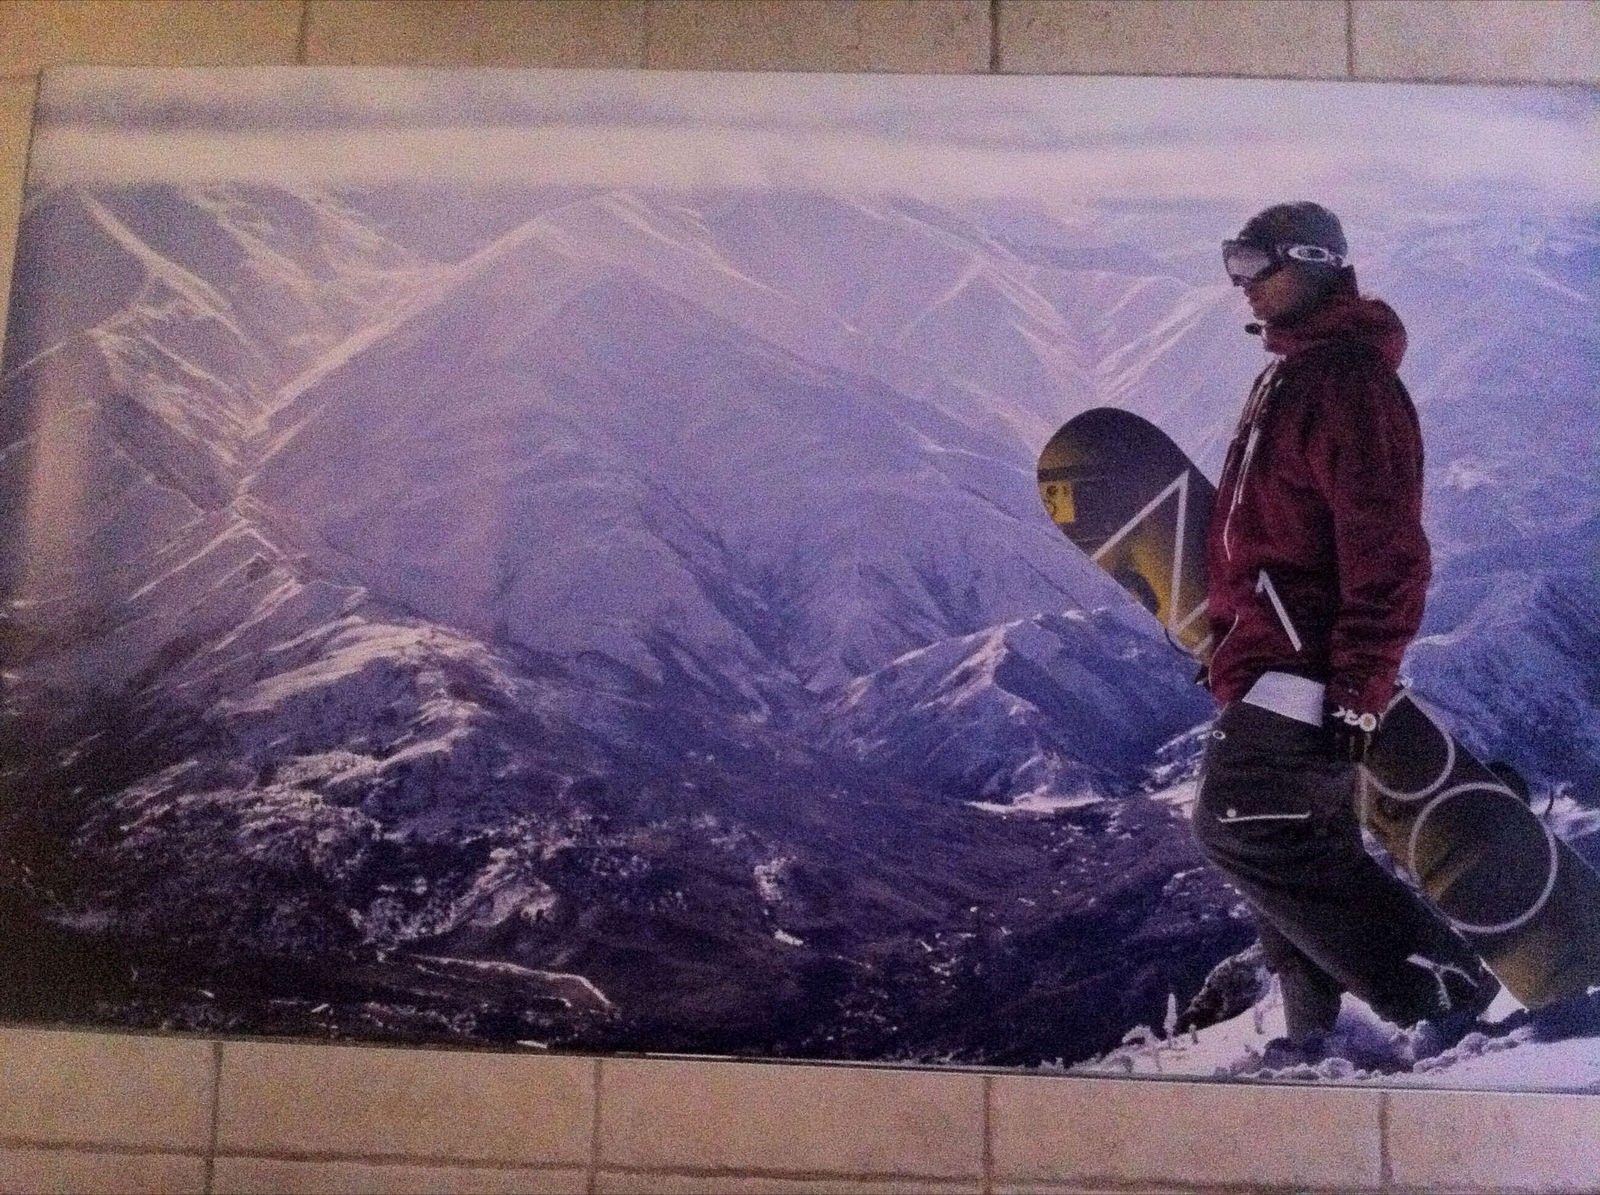 Oakley 4x7 Foot Magnetic Store Display Posters - IMG_1359.JPG